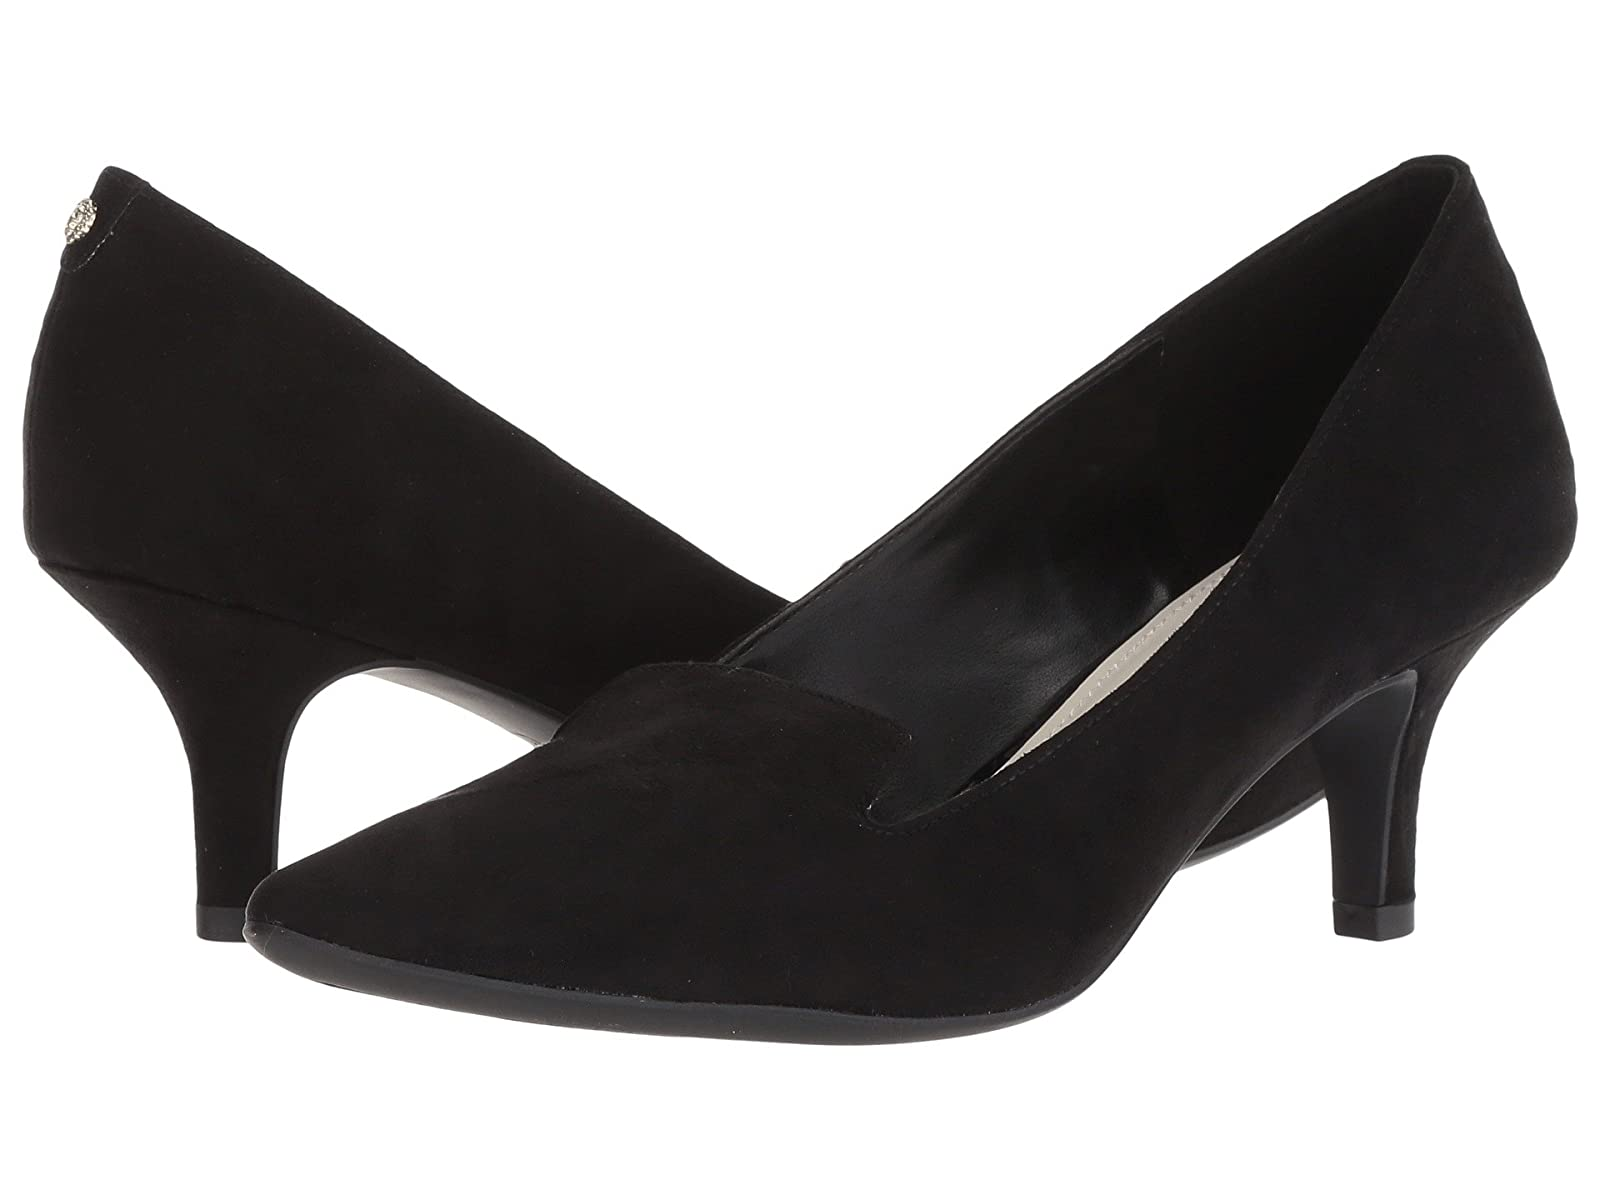 Anne Klein FeliceAtmospheric grades have affordable shoes